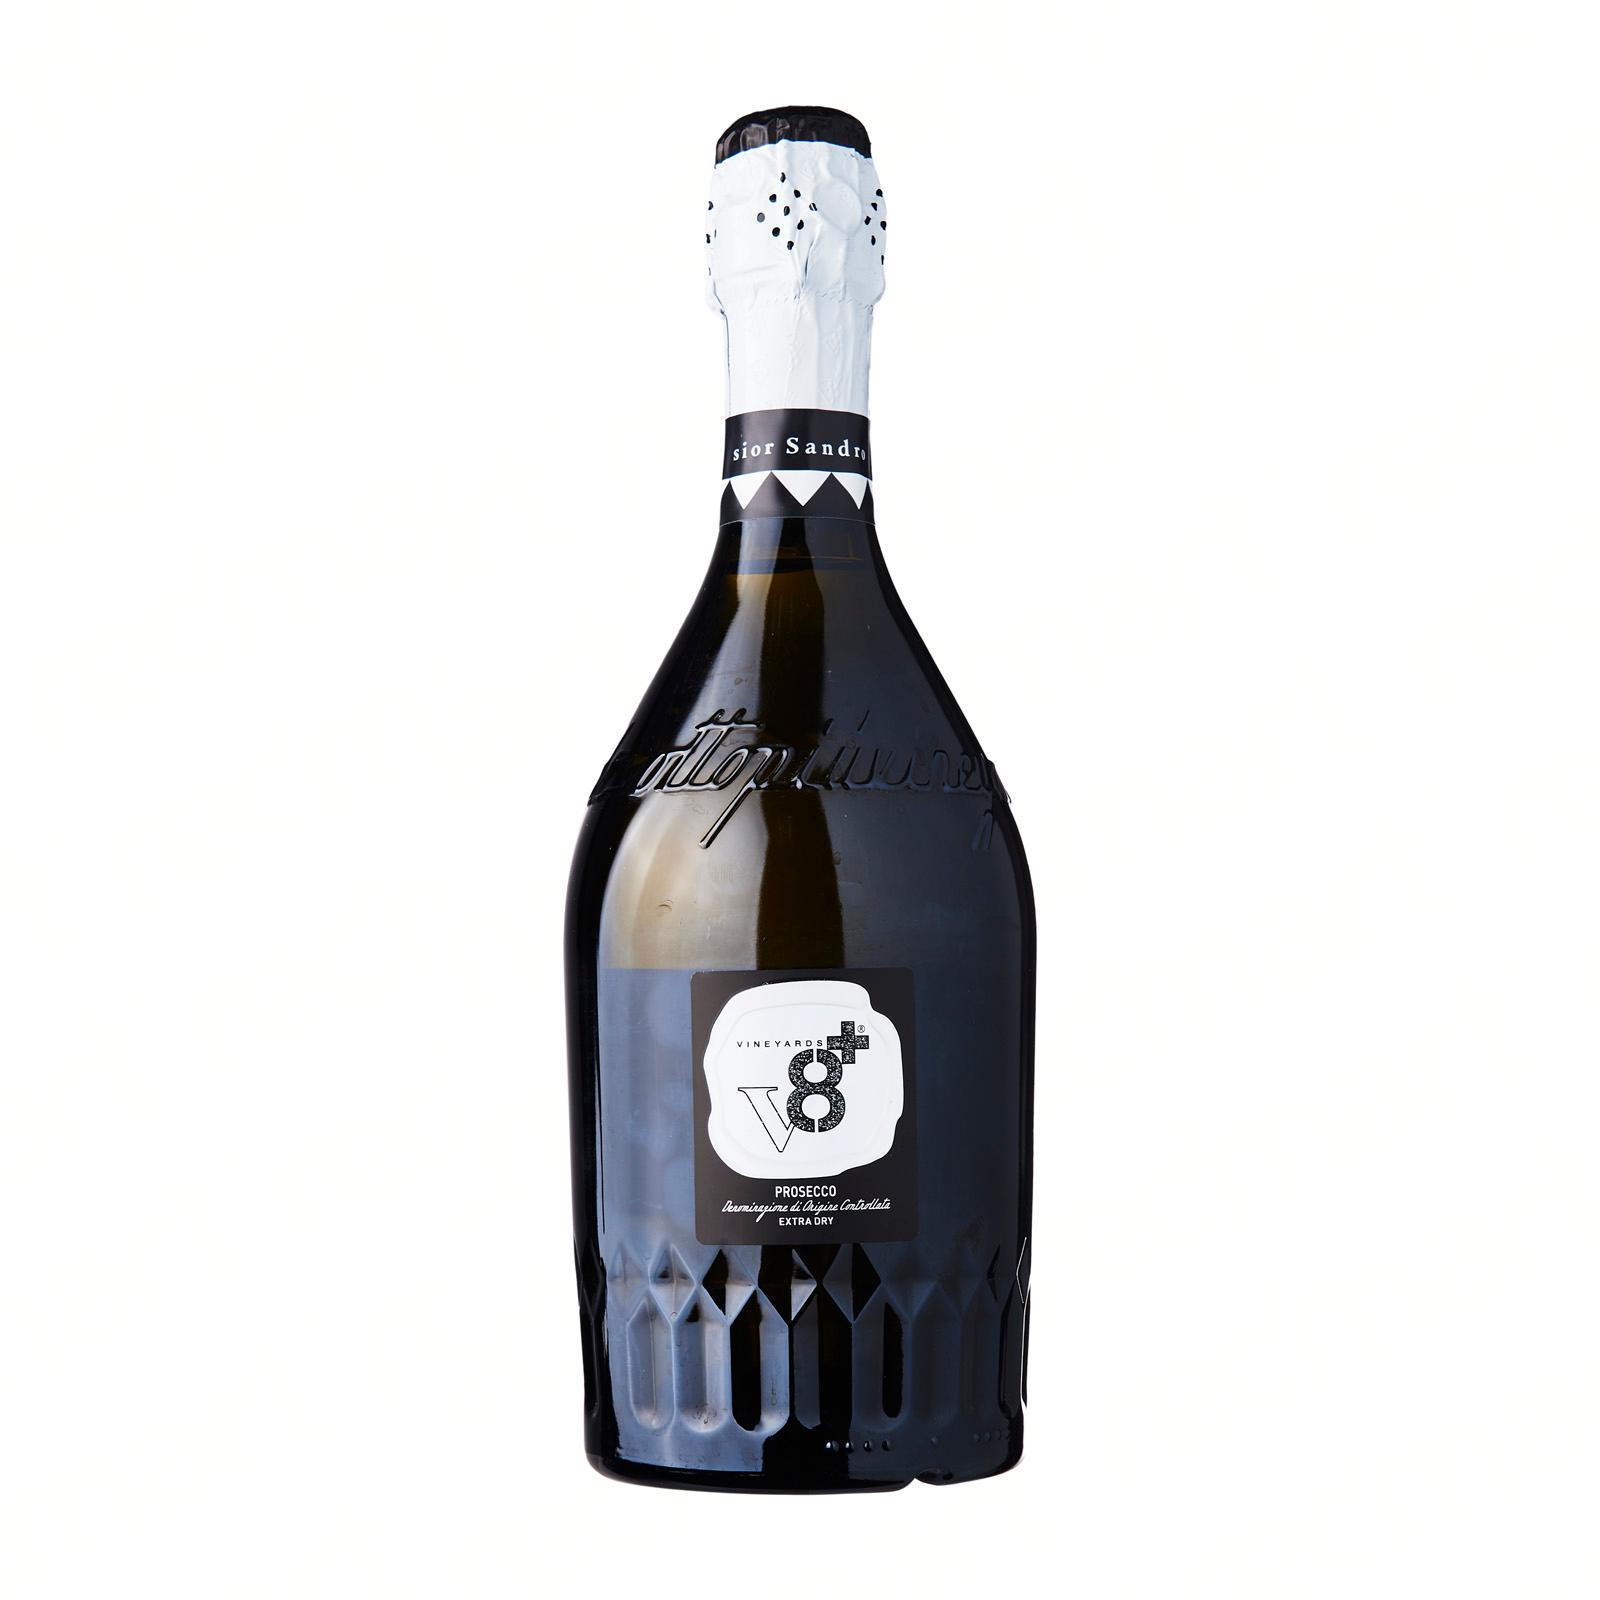 Vineyards V8+ Prosecco Doc Extra Dry Sior Sandro